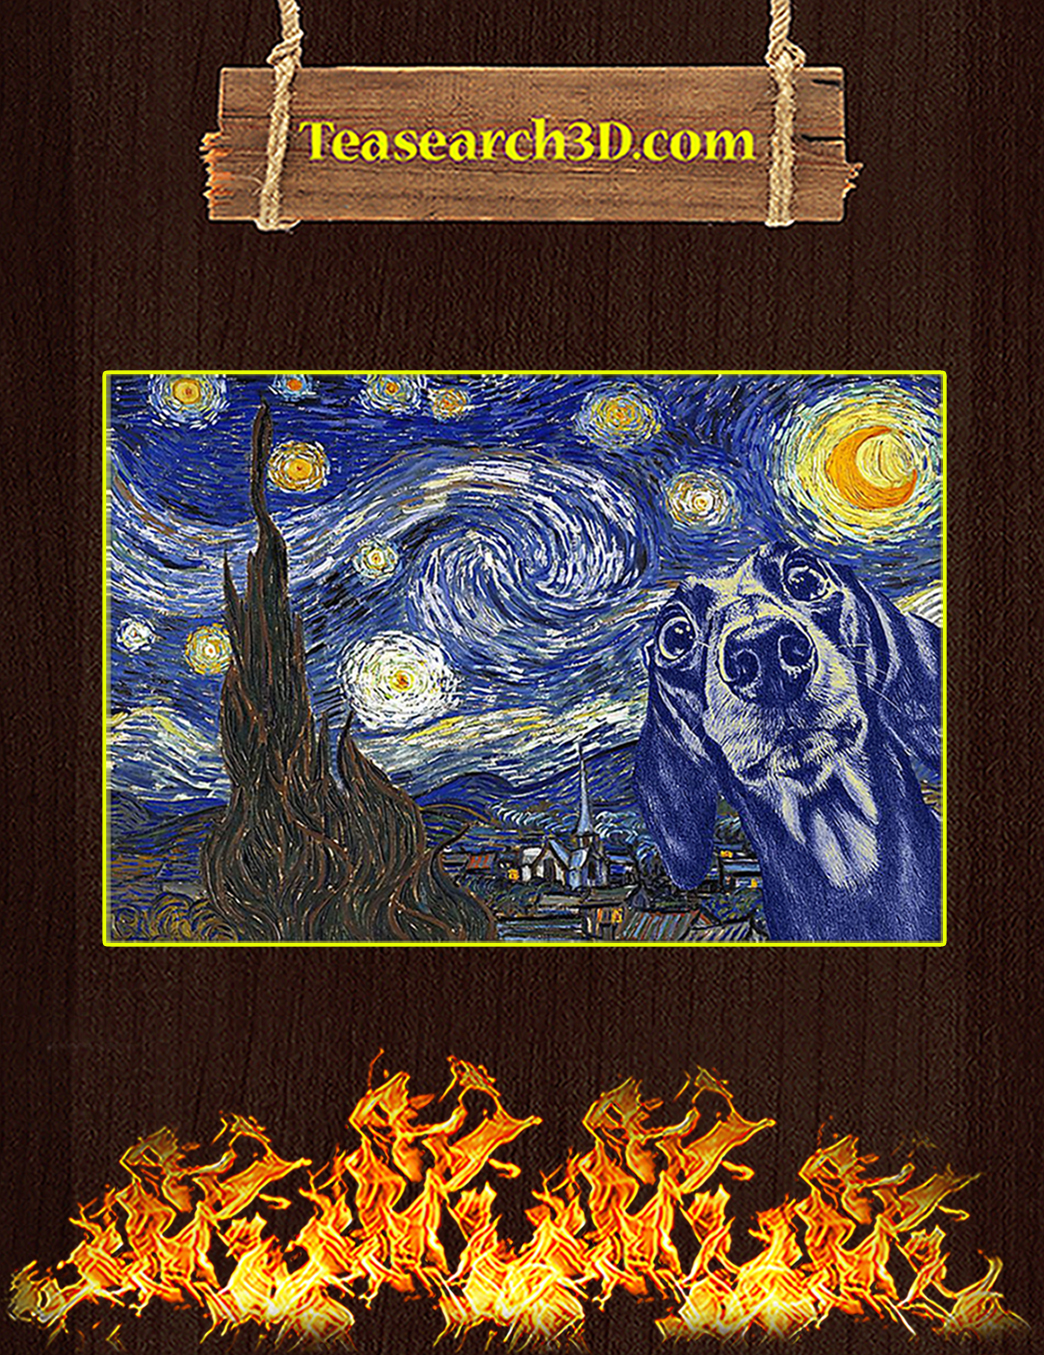 Dachshund van gogh starry night poster A1